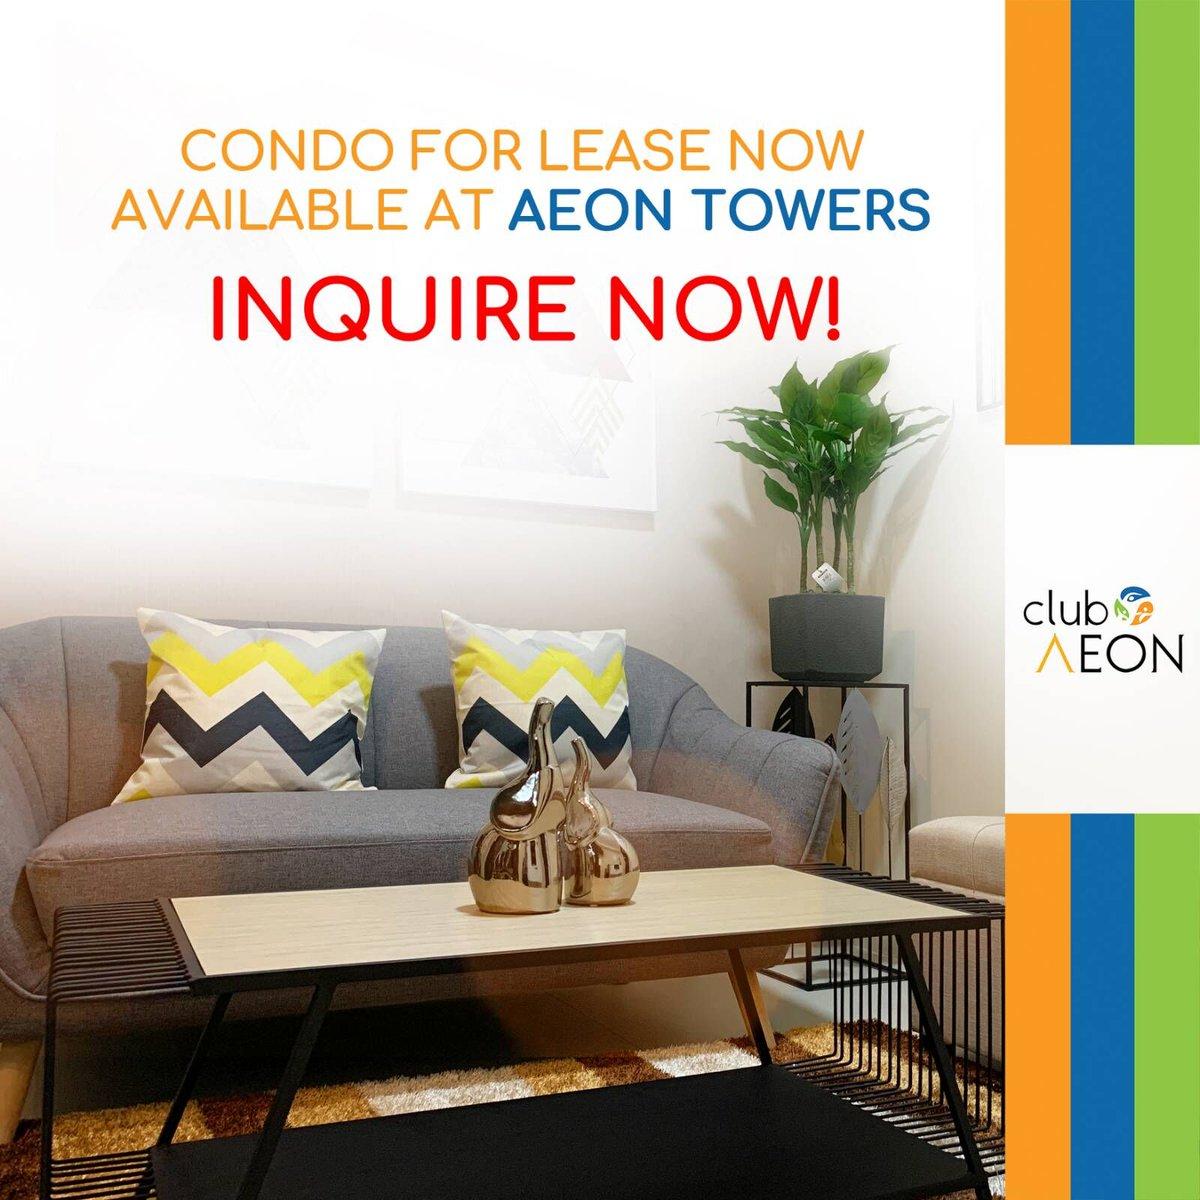 Aeon Towers now offers condo units for lease! Want to know more? Message here-->   #condounits #condo #condominium #condounitforlease #davaocity #ClubAeon #AeonTowers #AeonTowersDavao #AeonLuxeProperties #AeonLuxe #ALPI